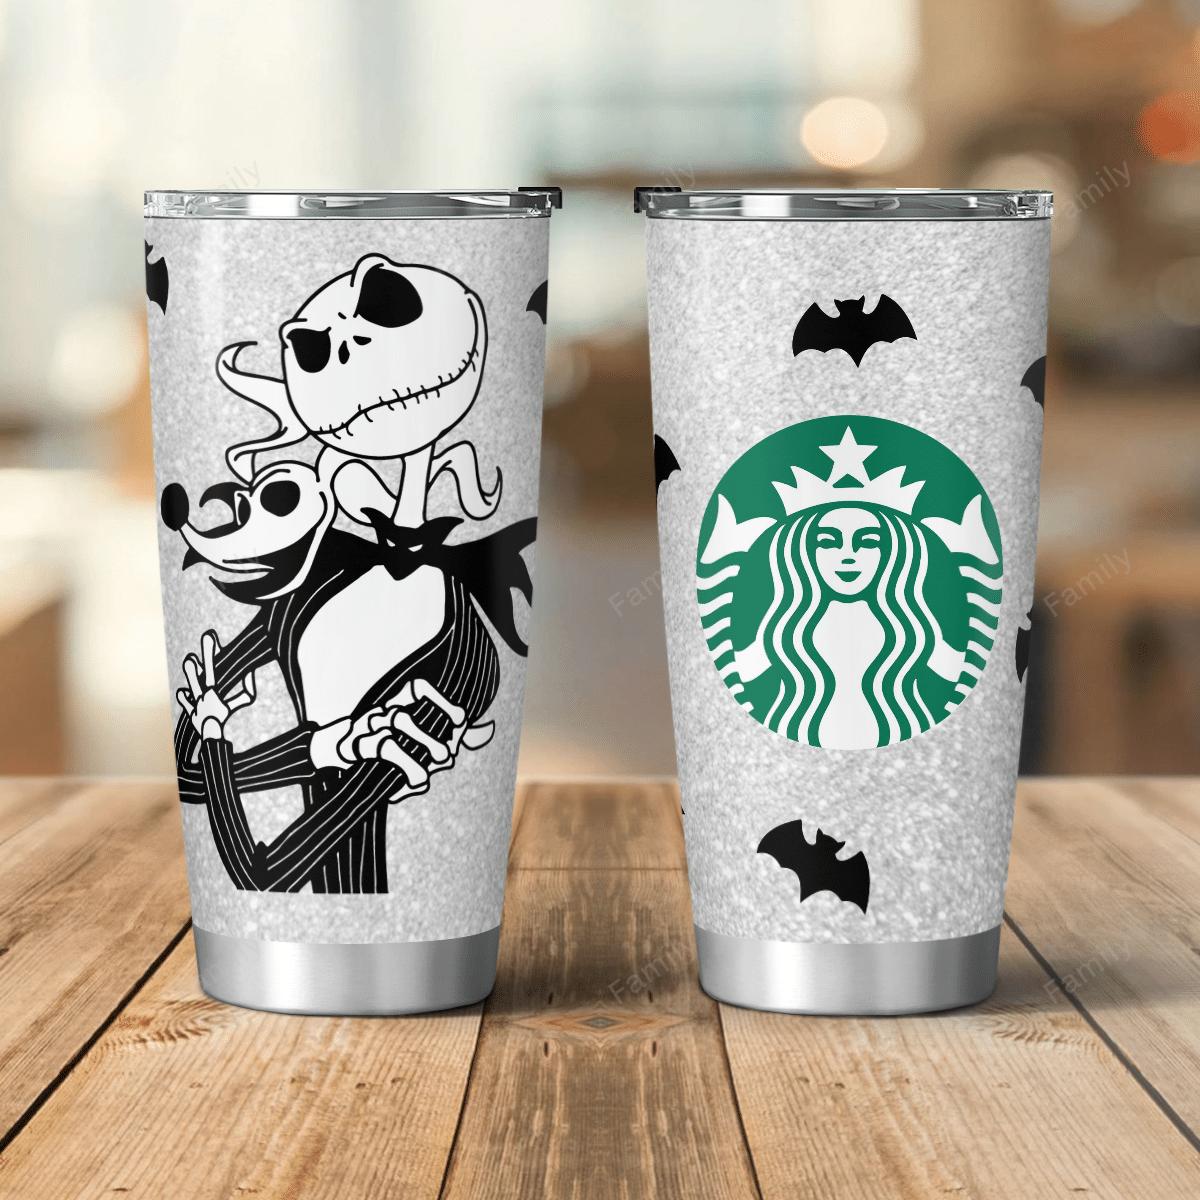 The Nightmare Jack Skellington Starbuck Coffee Silver Tumbler